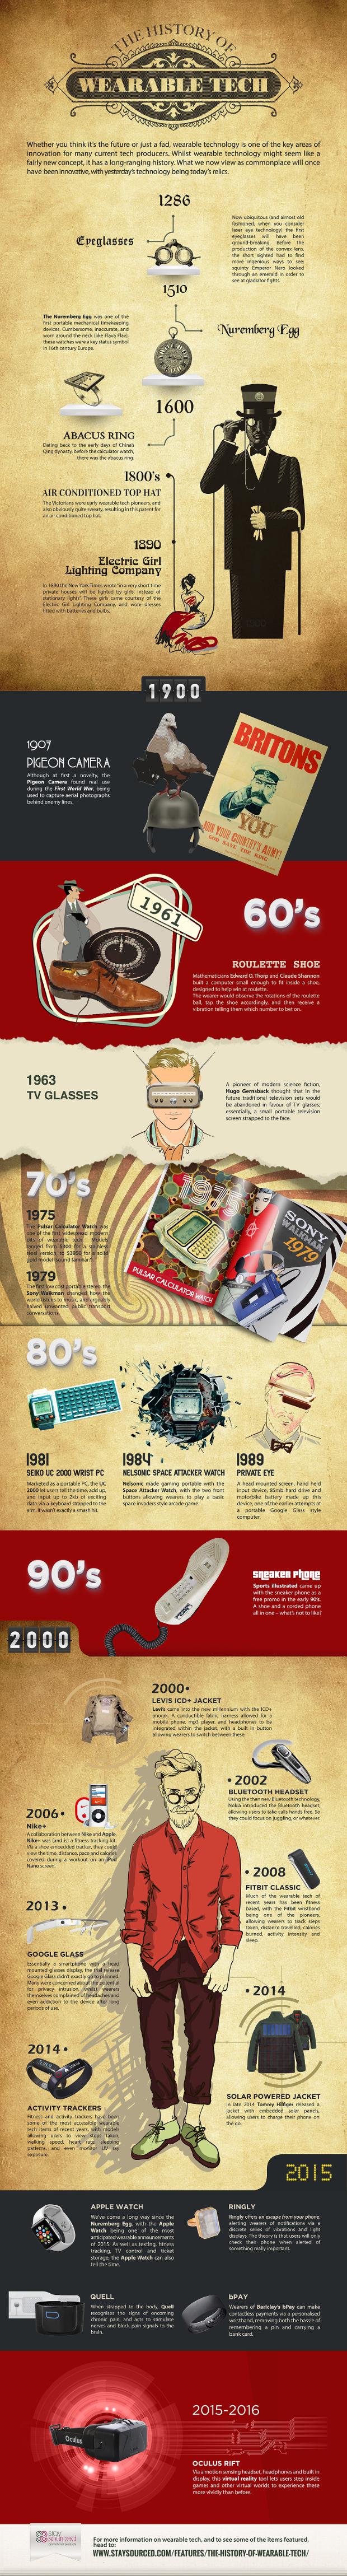 wearabletechnlogie.infographic